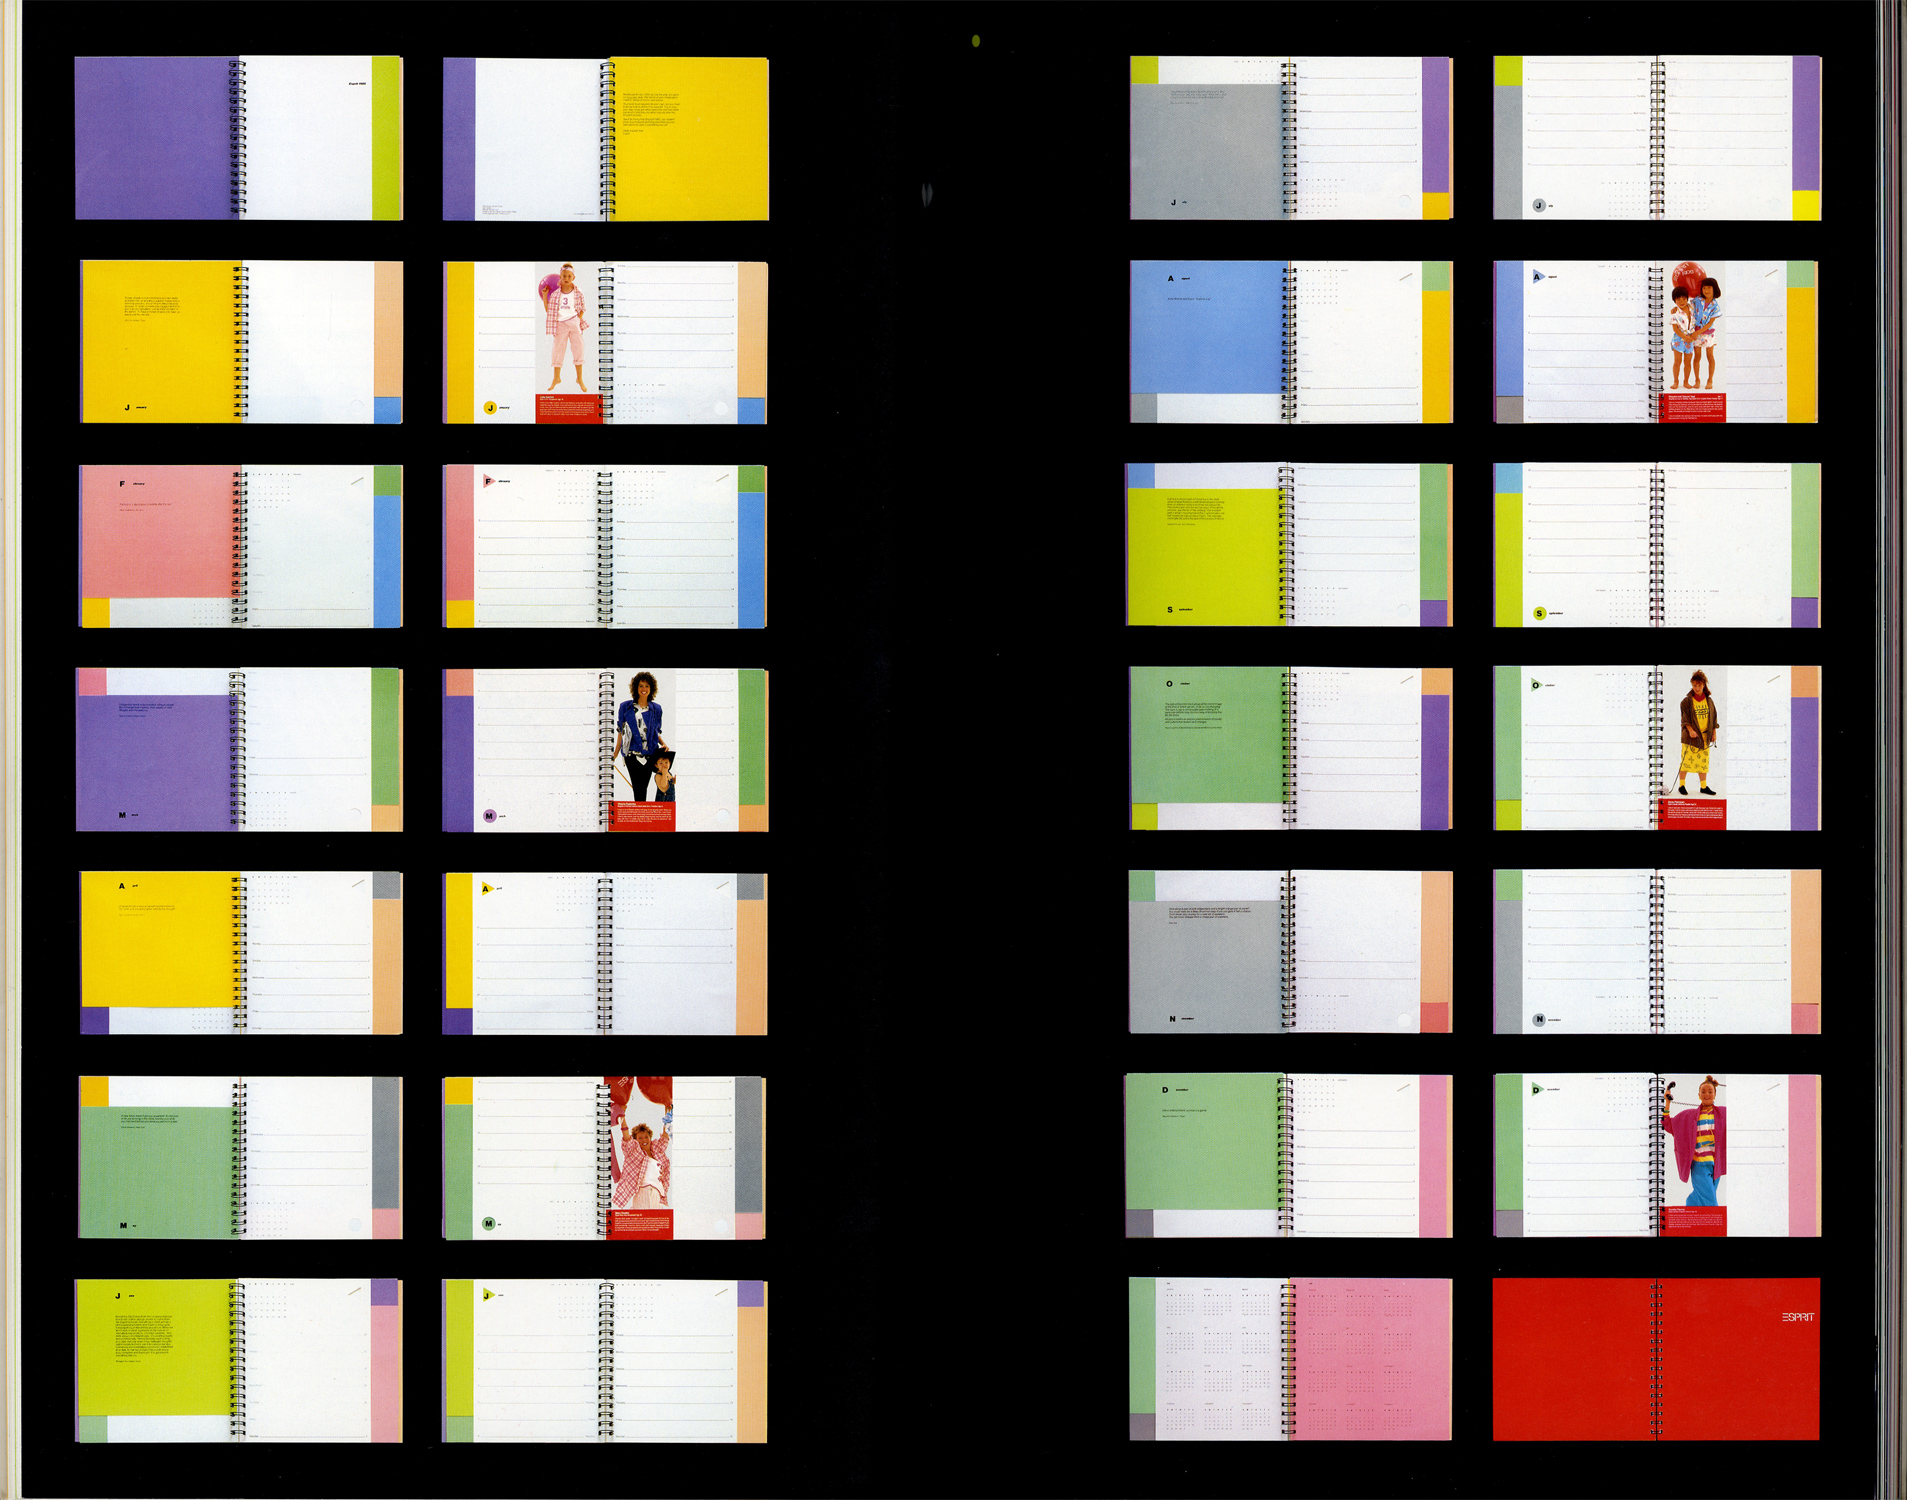 ESPRIT'S GRAPHIC WORKS 1984-1986[image3]